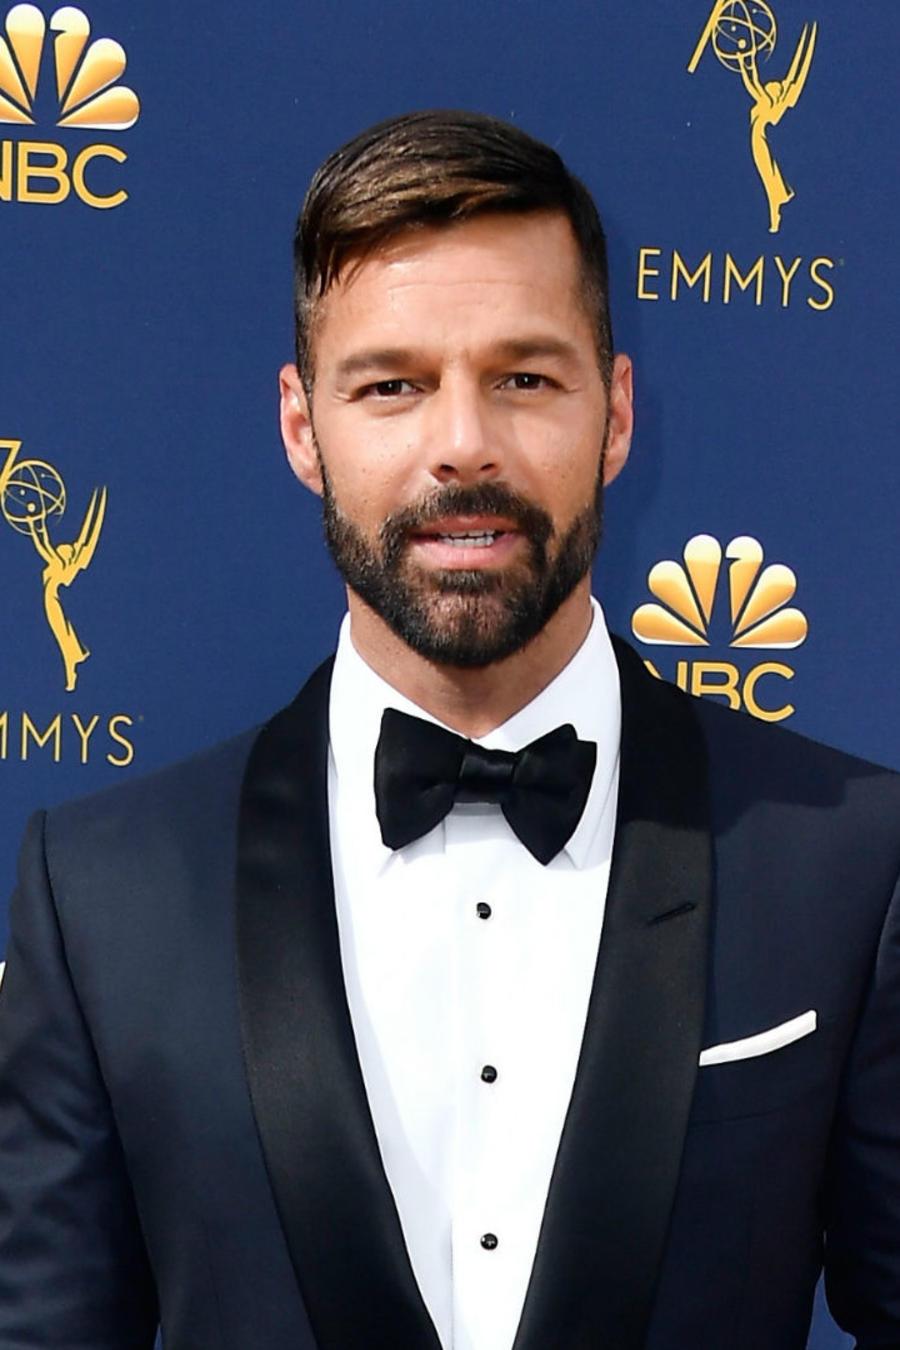 Ricky Martin en Emmy Awards 2018